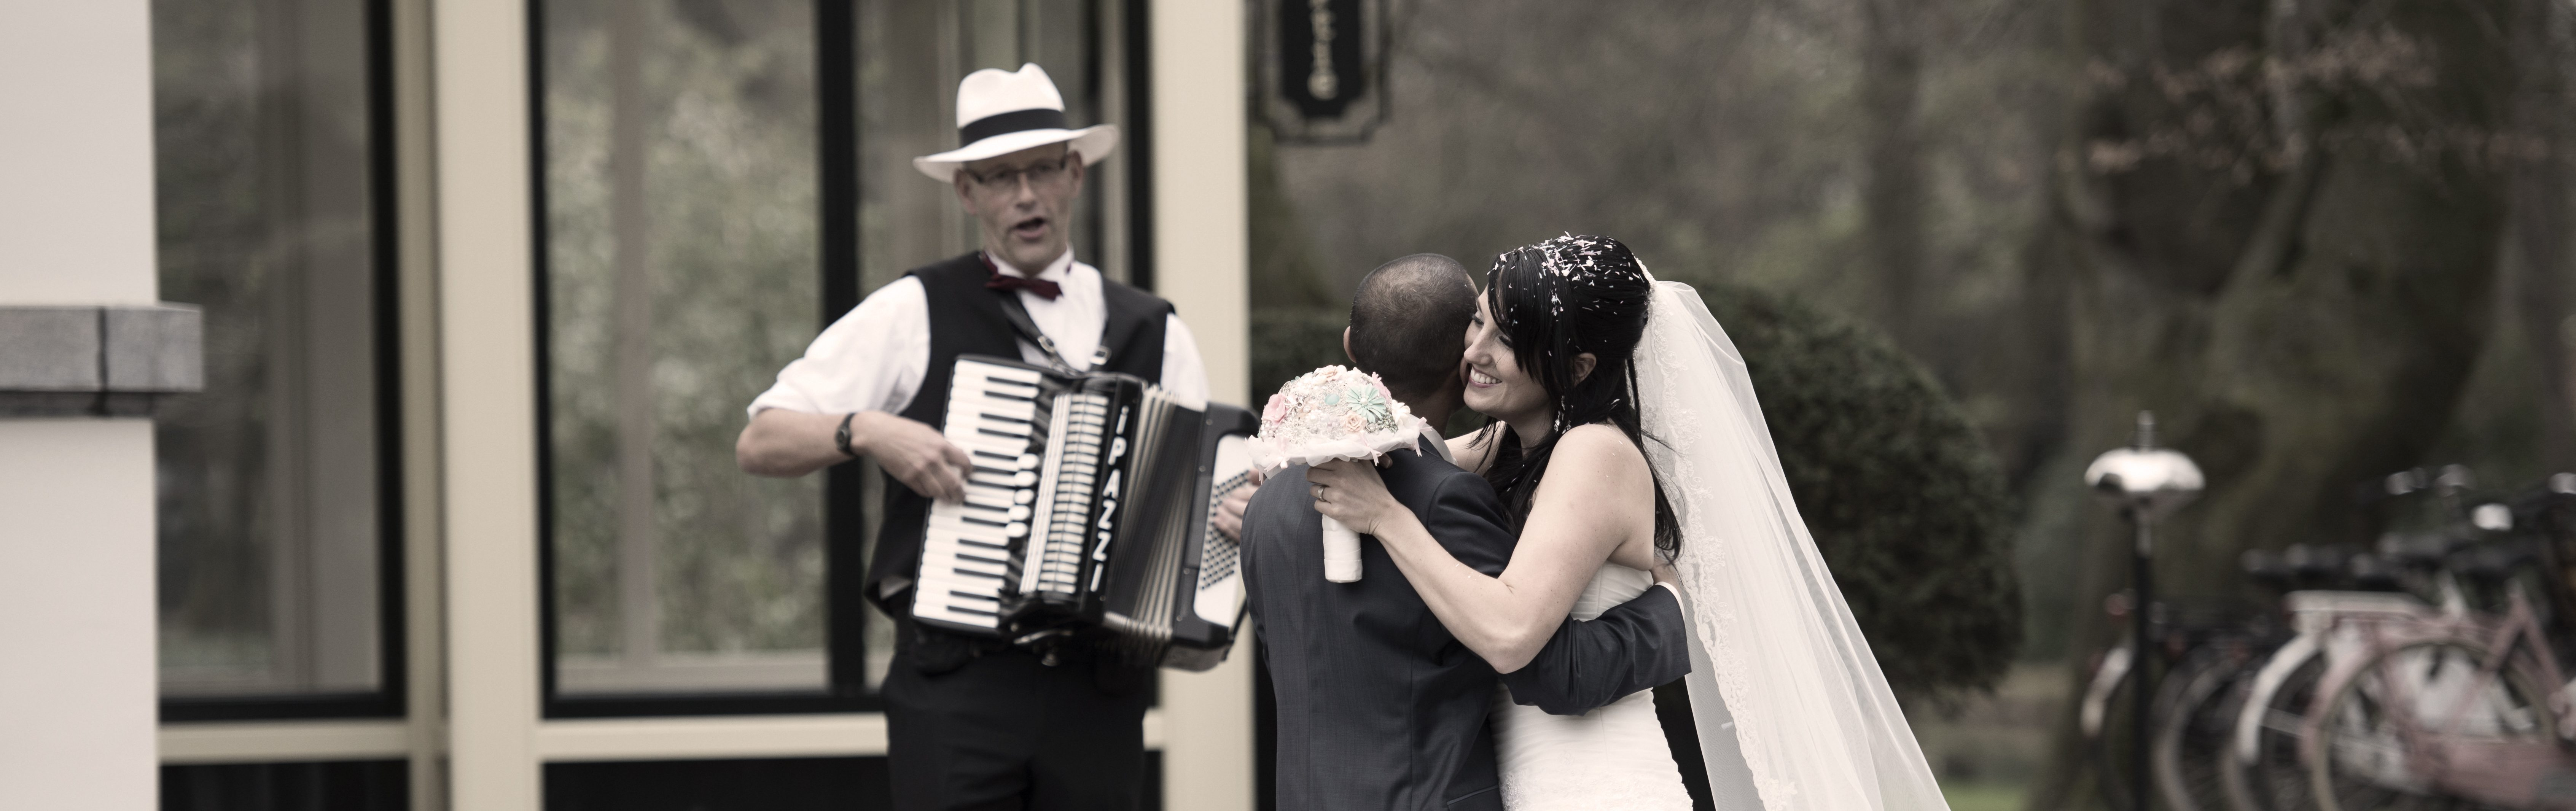 Trouwdag Huwelijk Bruiloft Muziek Accordeon Accordeonist Violist Pianist PazziMusic